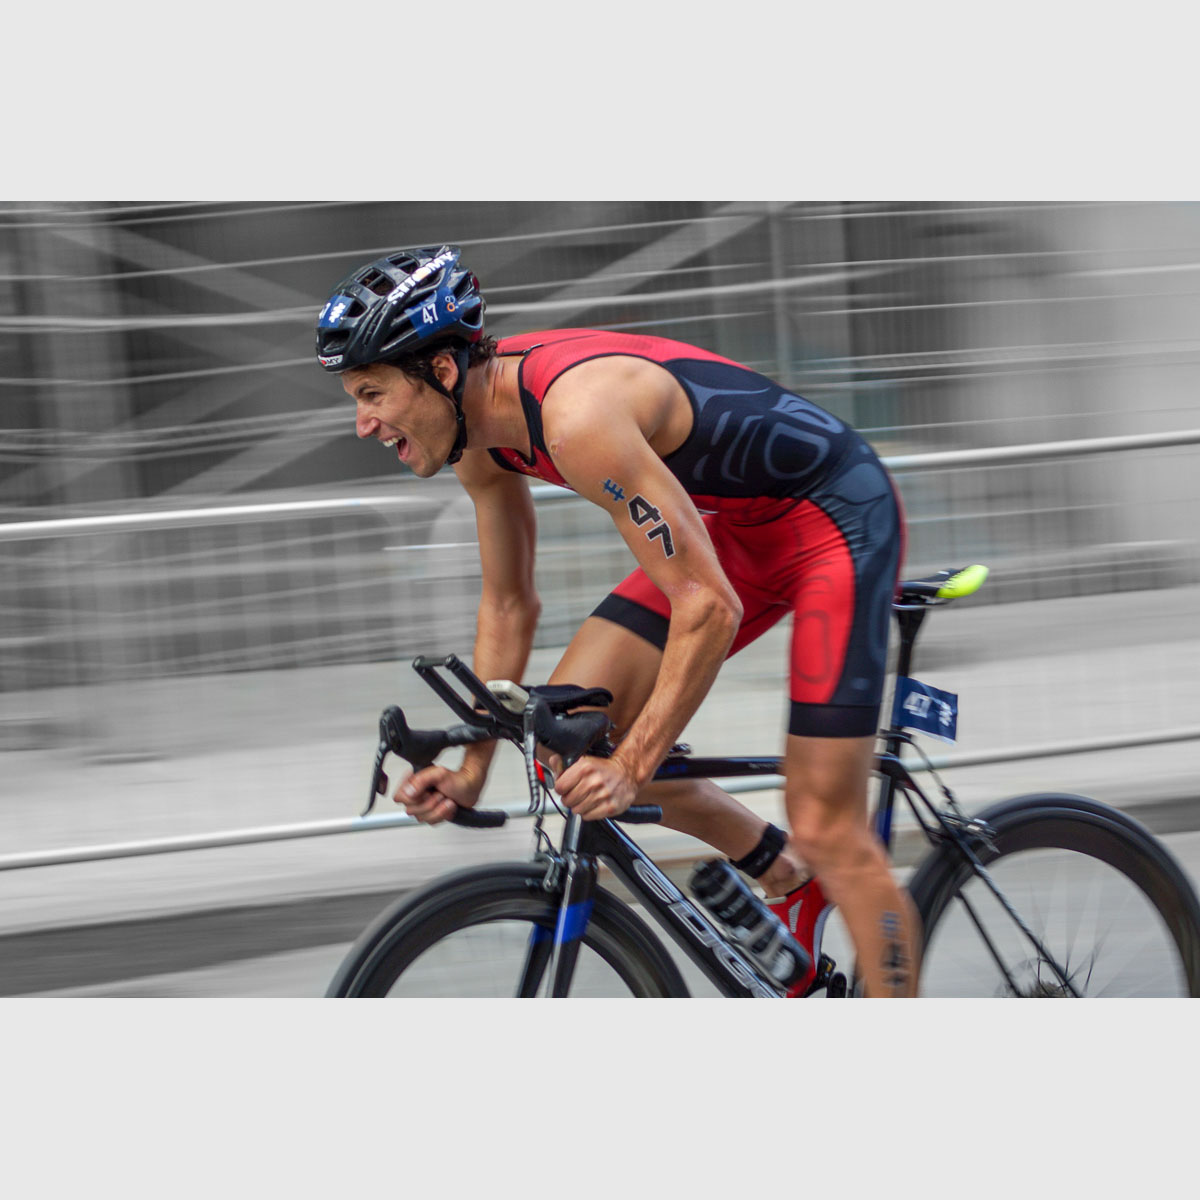 Michael Lori biking at the Montreal ITU Triathlon